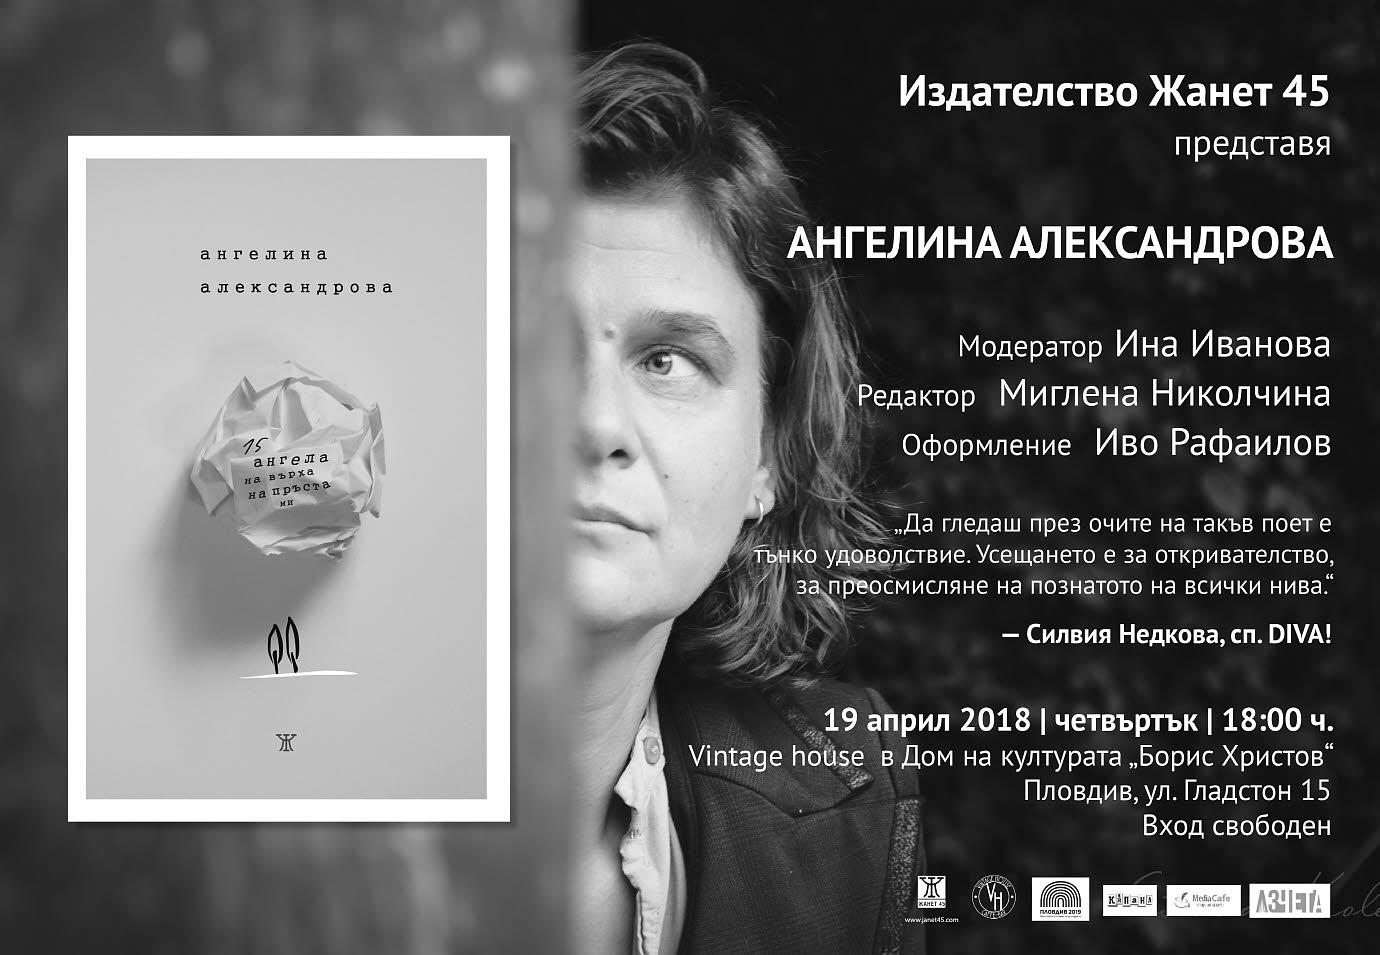 Angelina Aleksandrova Poster Plovdiv.p1.pdf.r72